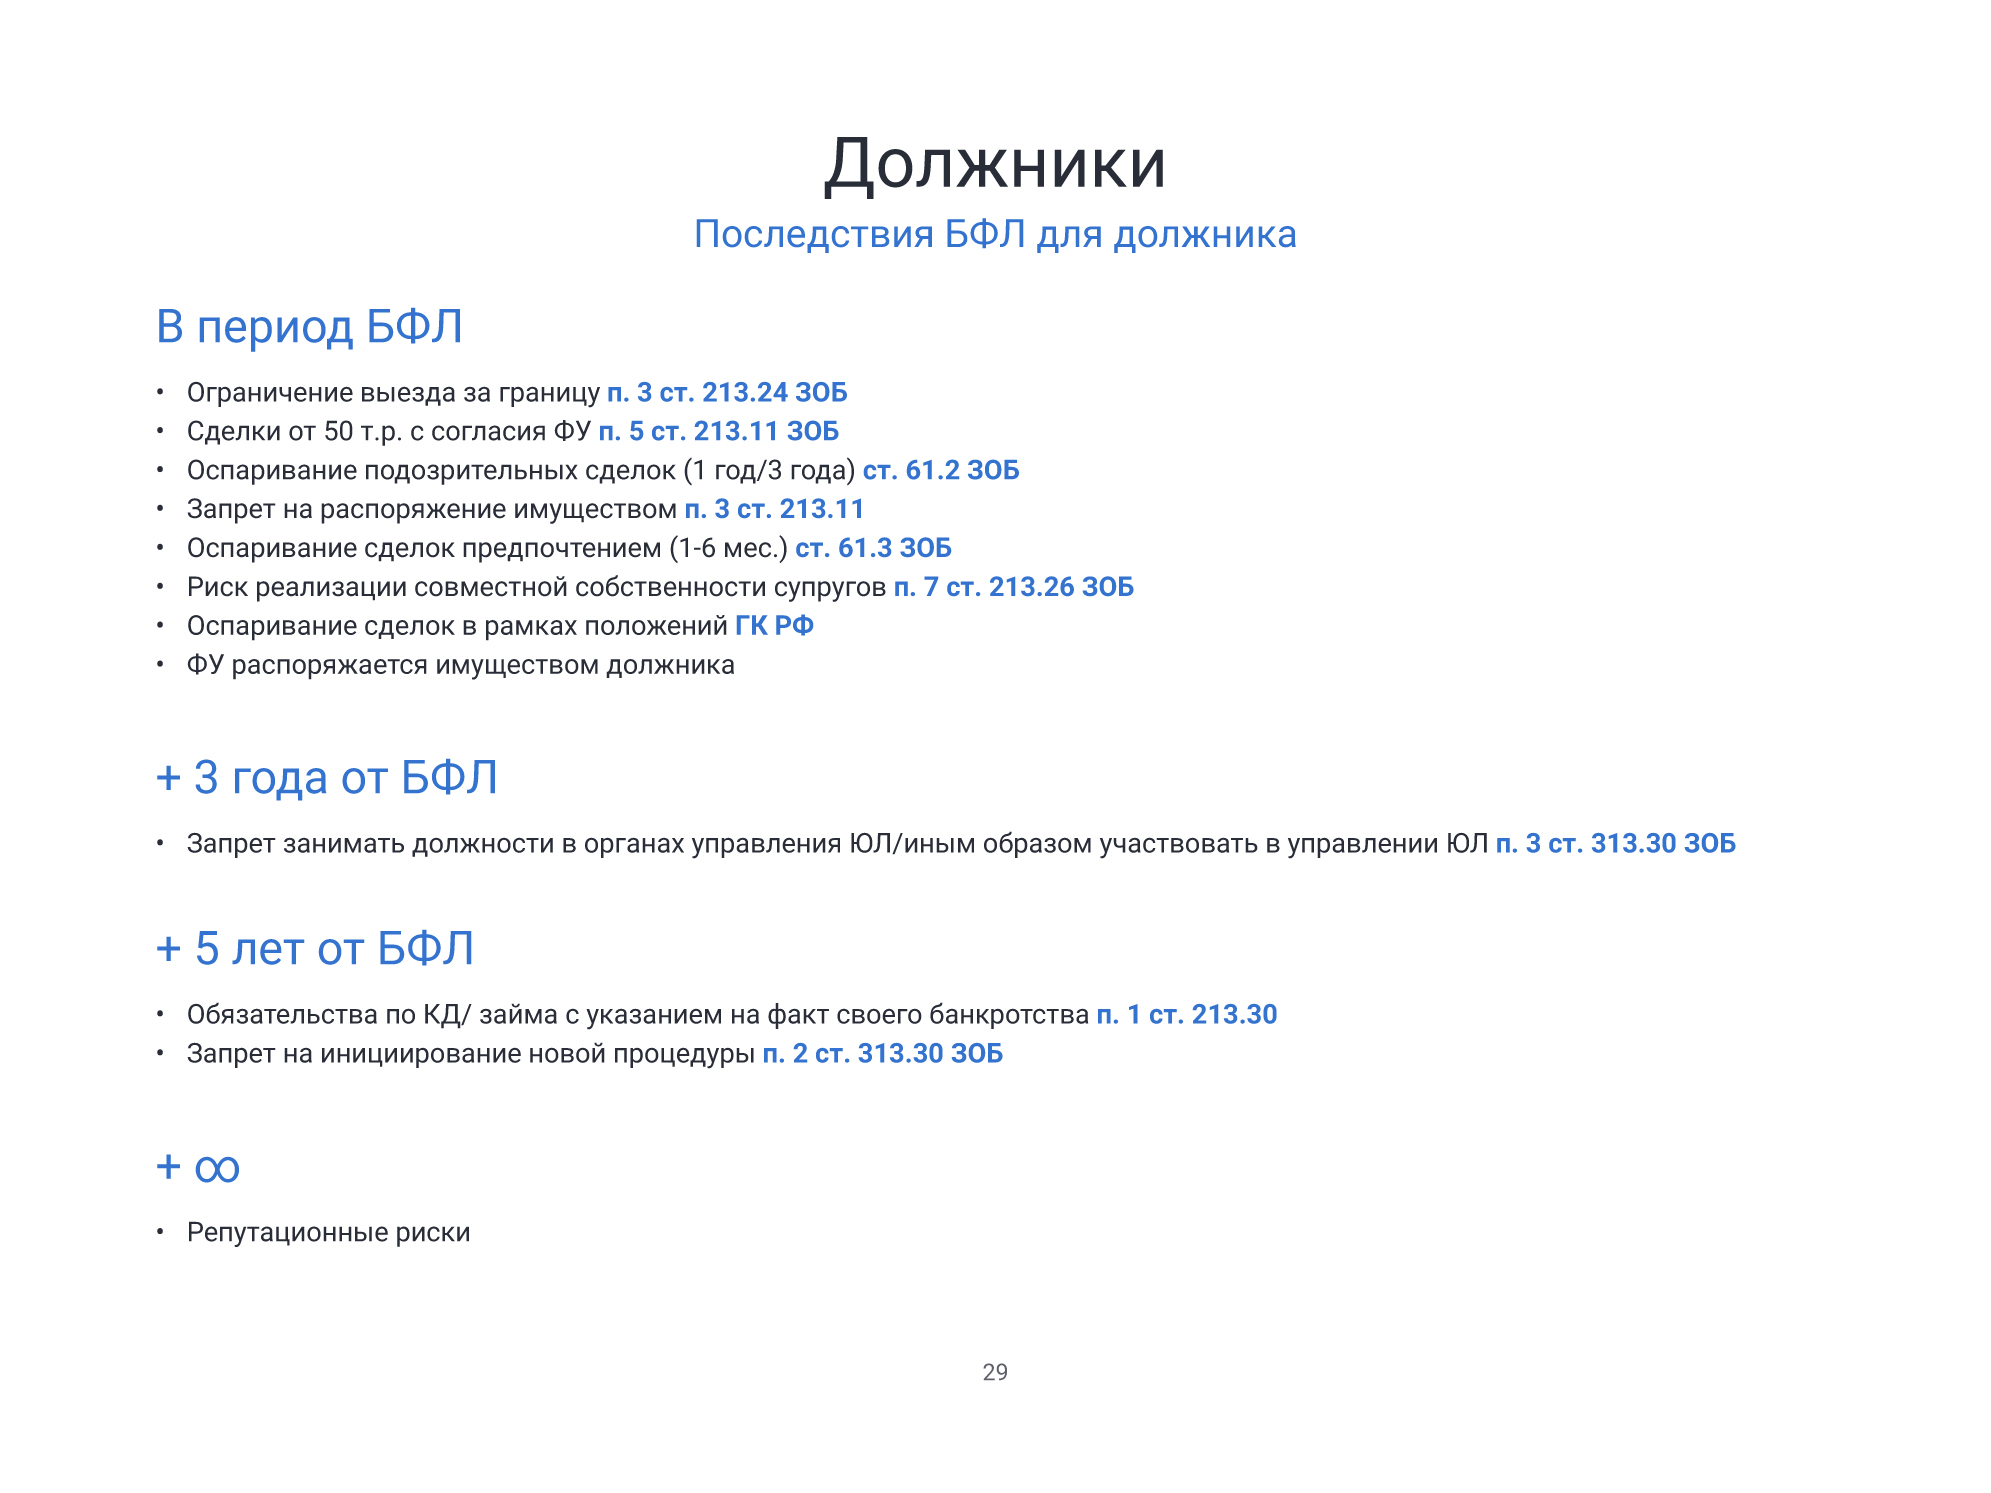 CB BFL Webinar